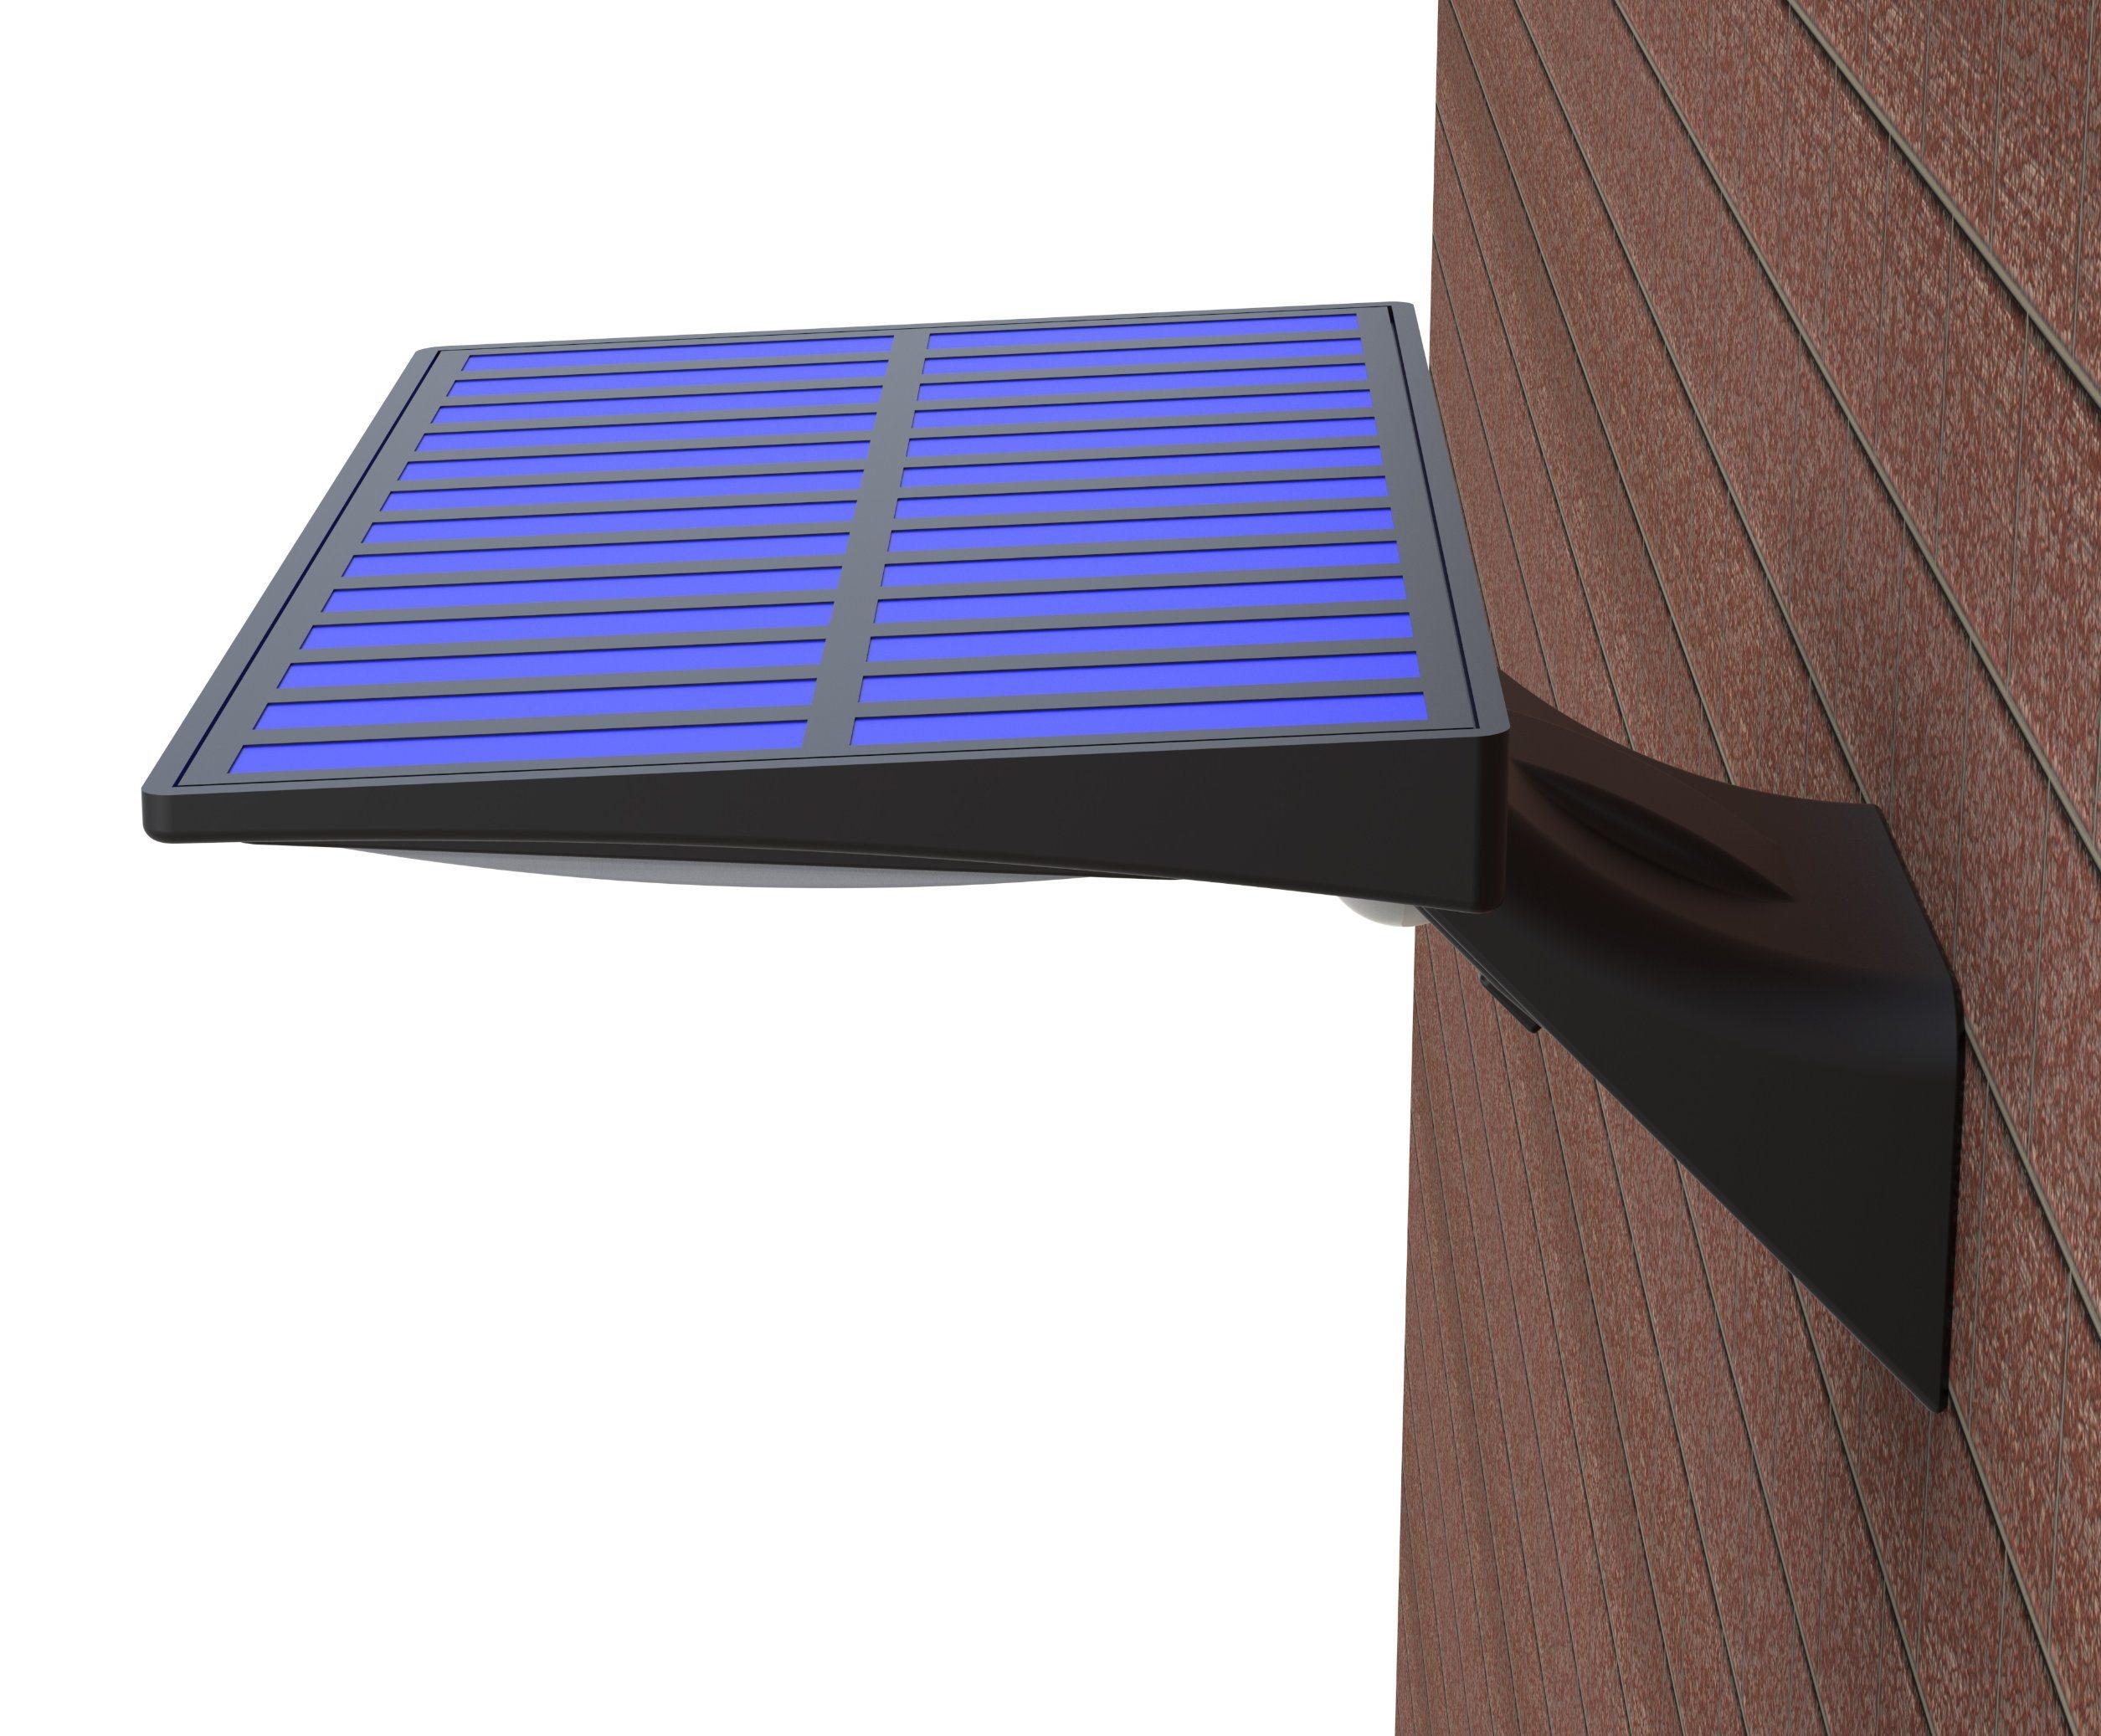 2 x SOLAR LED WALL FENCE STEP LIGHTS STAIR DOOR OUTDOOR DECKING GARDEN PATHWAY